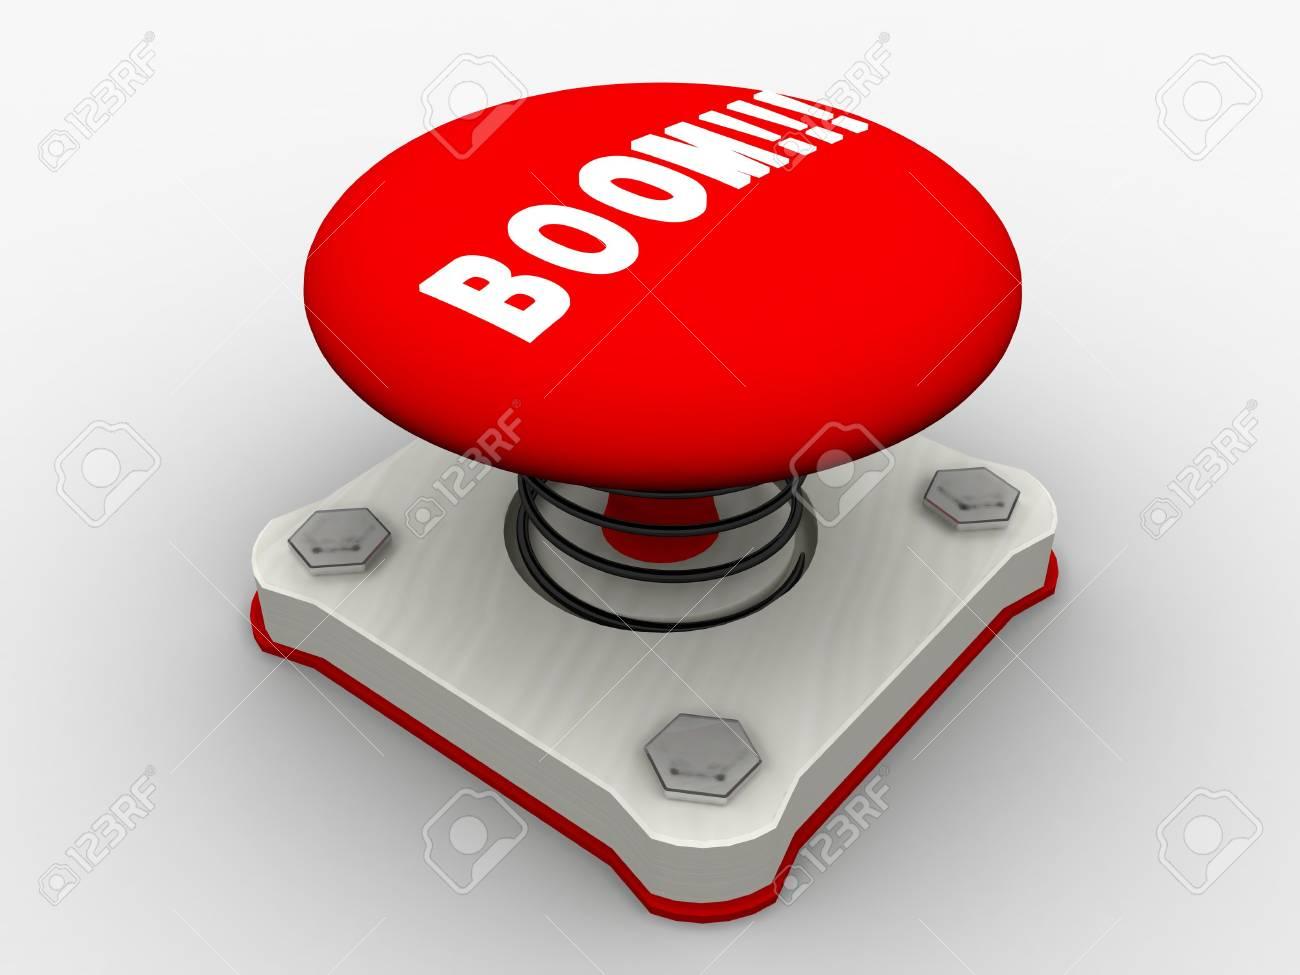 Red start button on a metal platform Stock Photo - 5338640